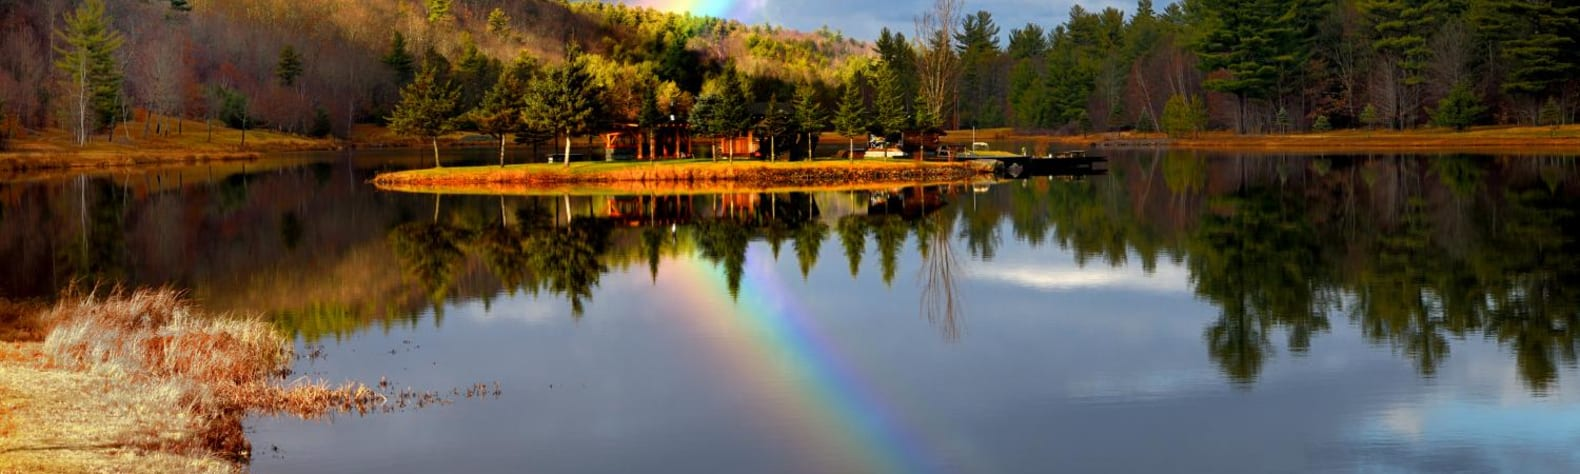 Paradise in the Adirondacks